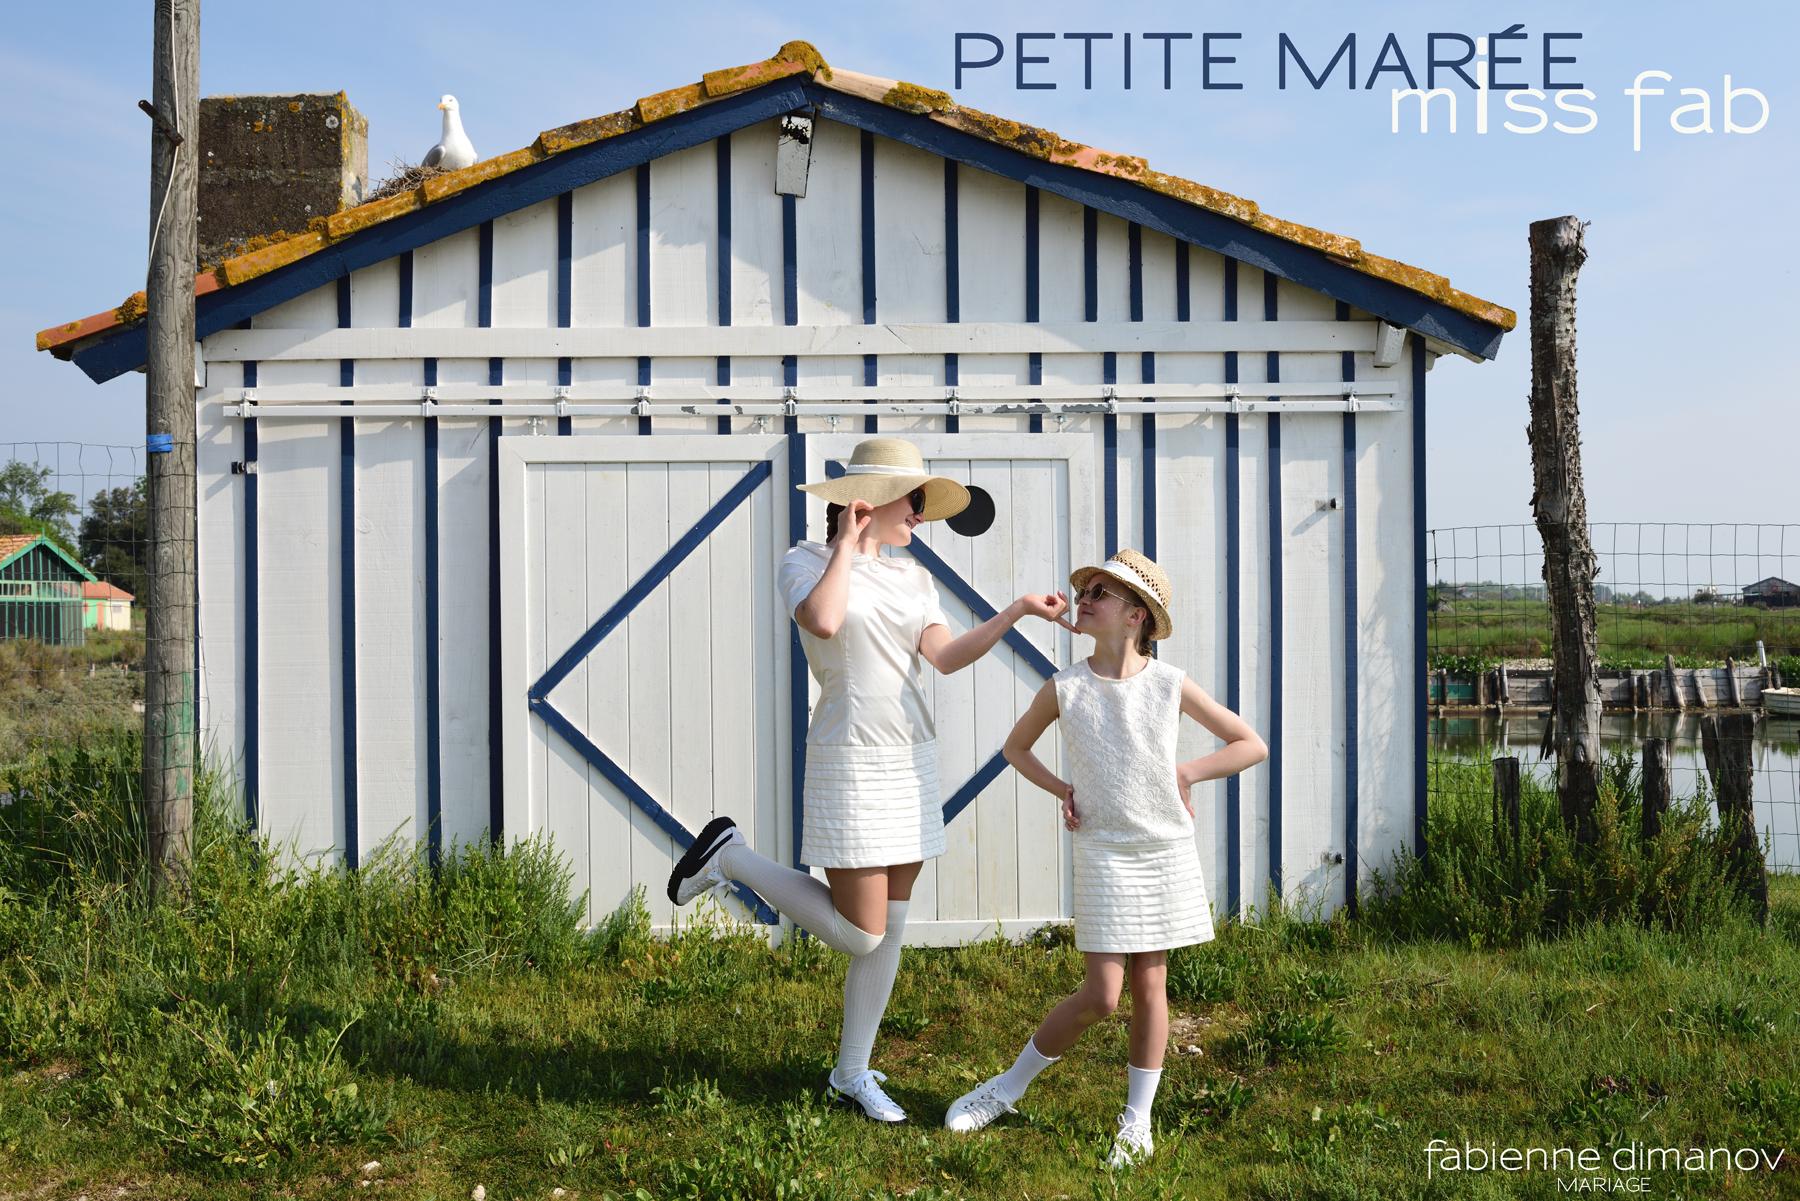 PETITE MARIÉE vs PETITE MARÉE - MISS FAB - Fabienne dimanov Mariage